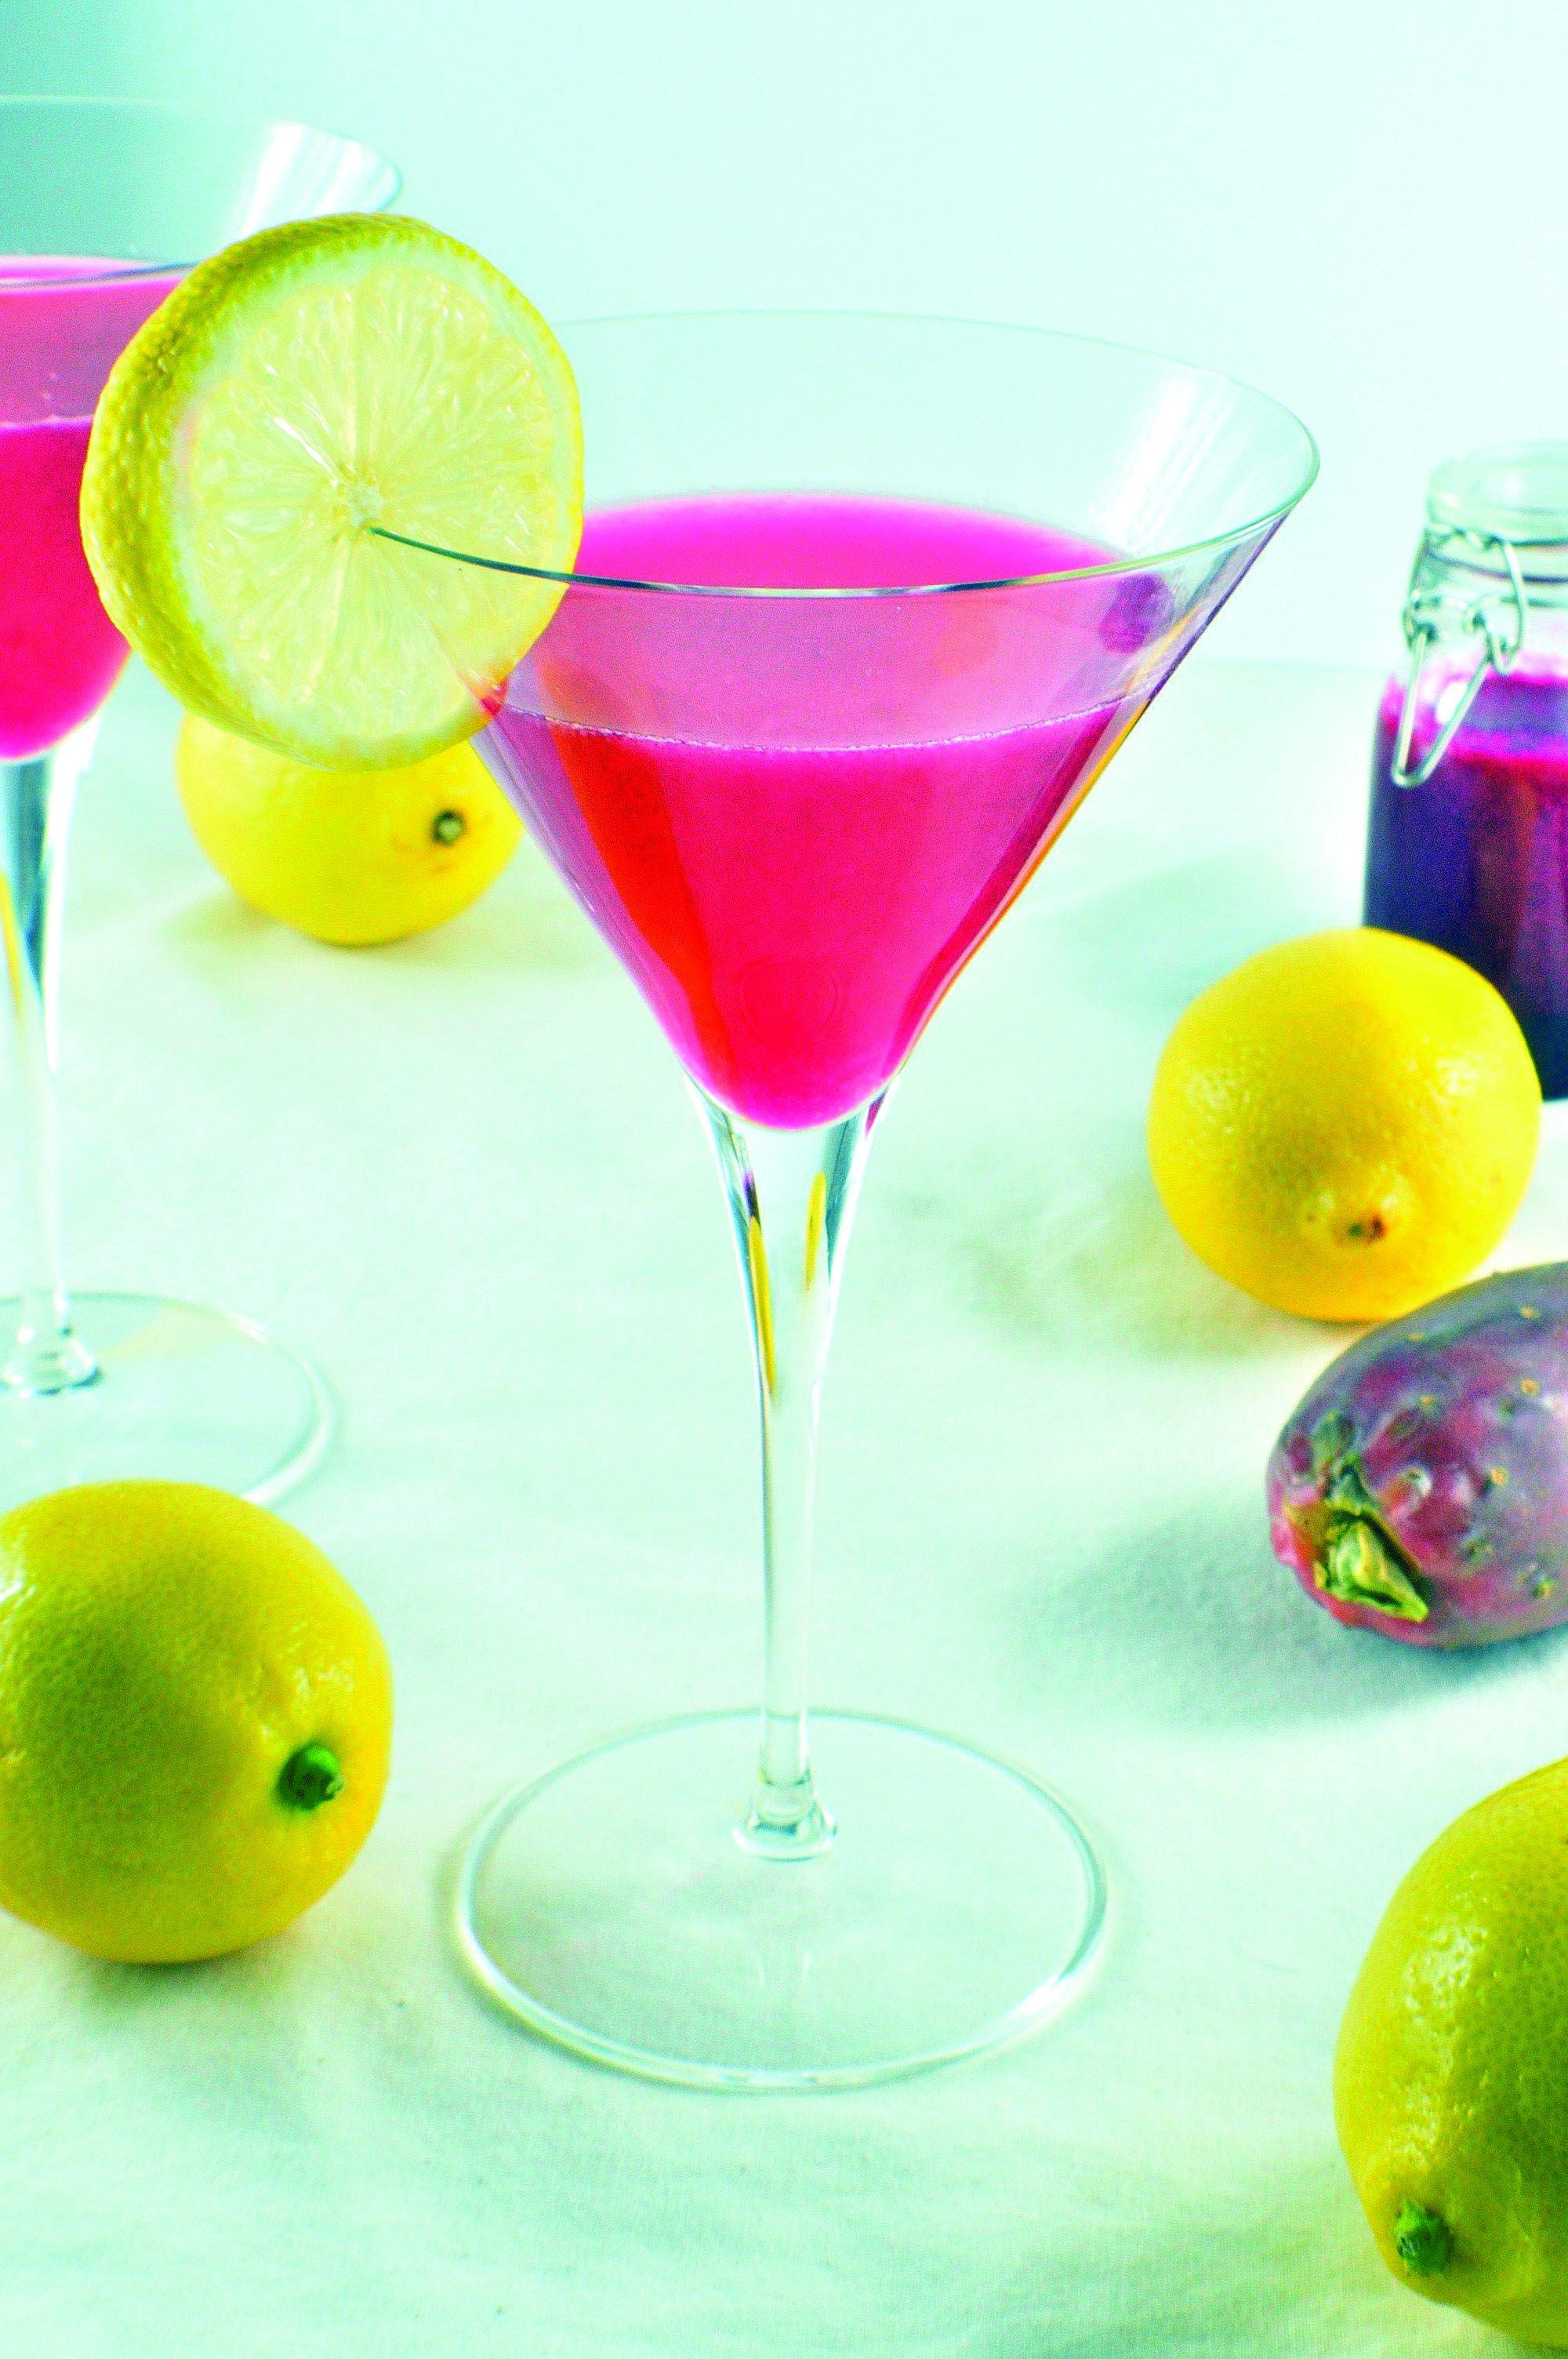 Lemon drop martini lemon drop martini lemon drop